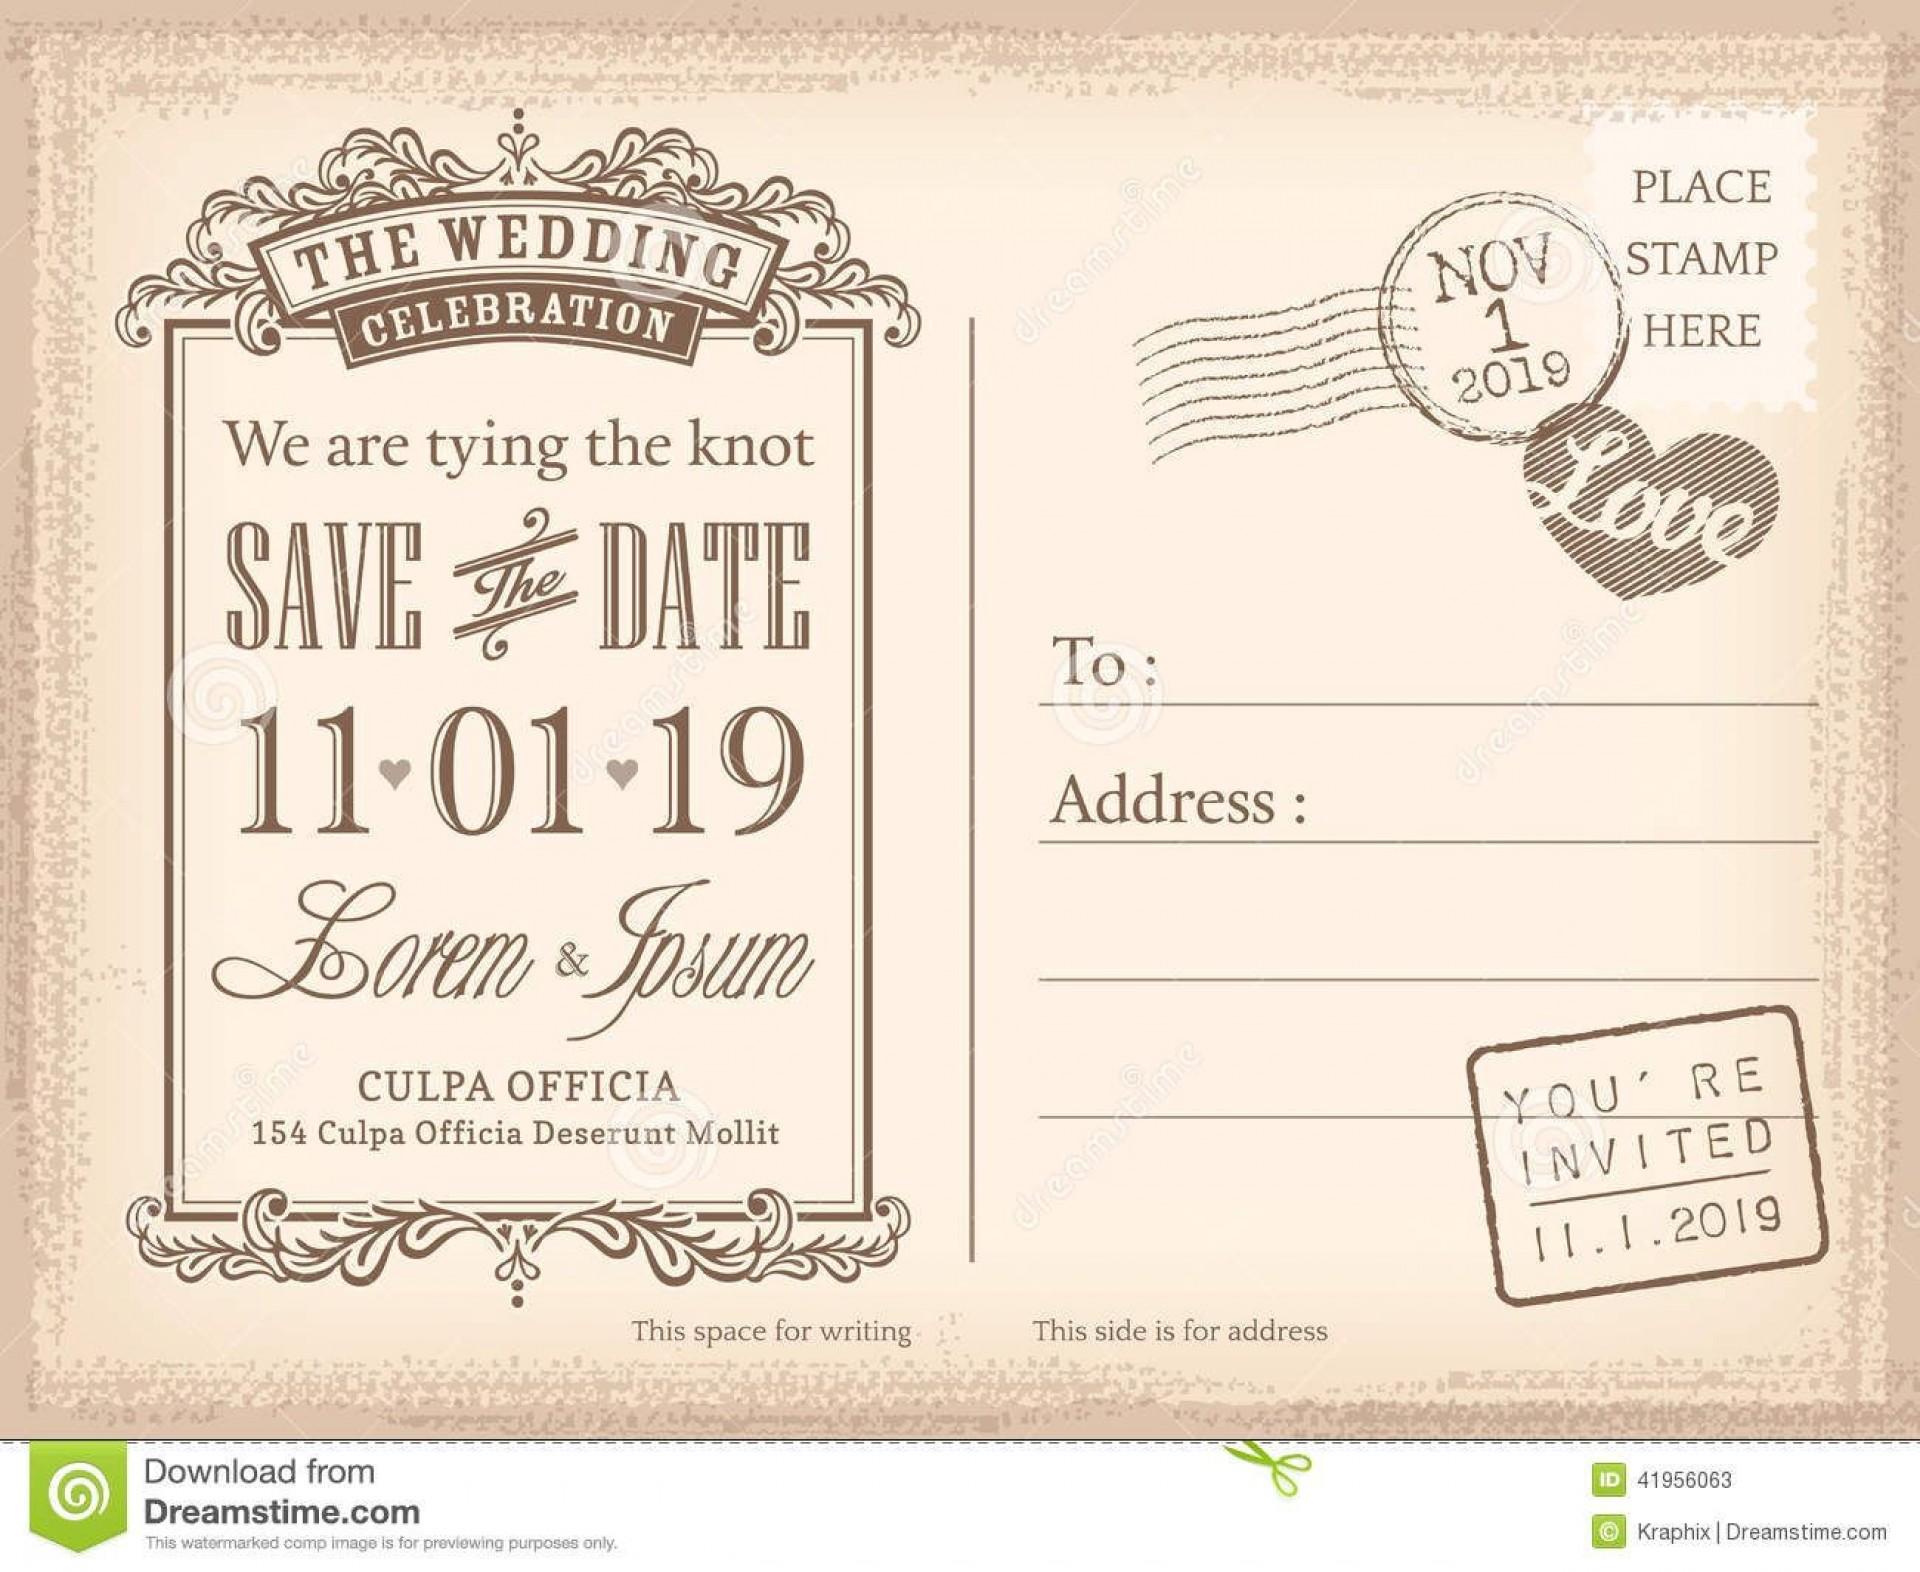 008 Sensational Save The Date Postcard Template Example  Diy Free Birthday1920